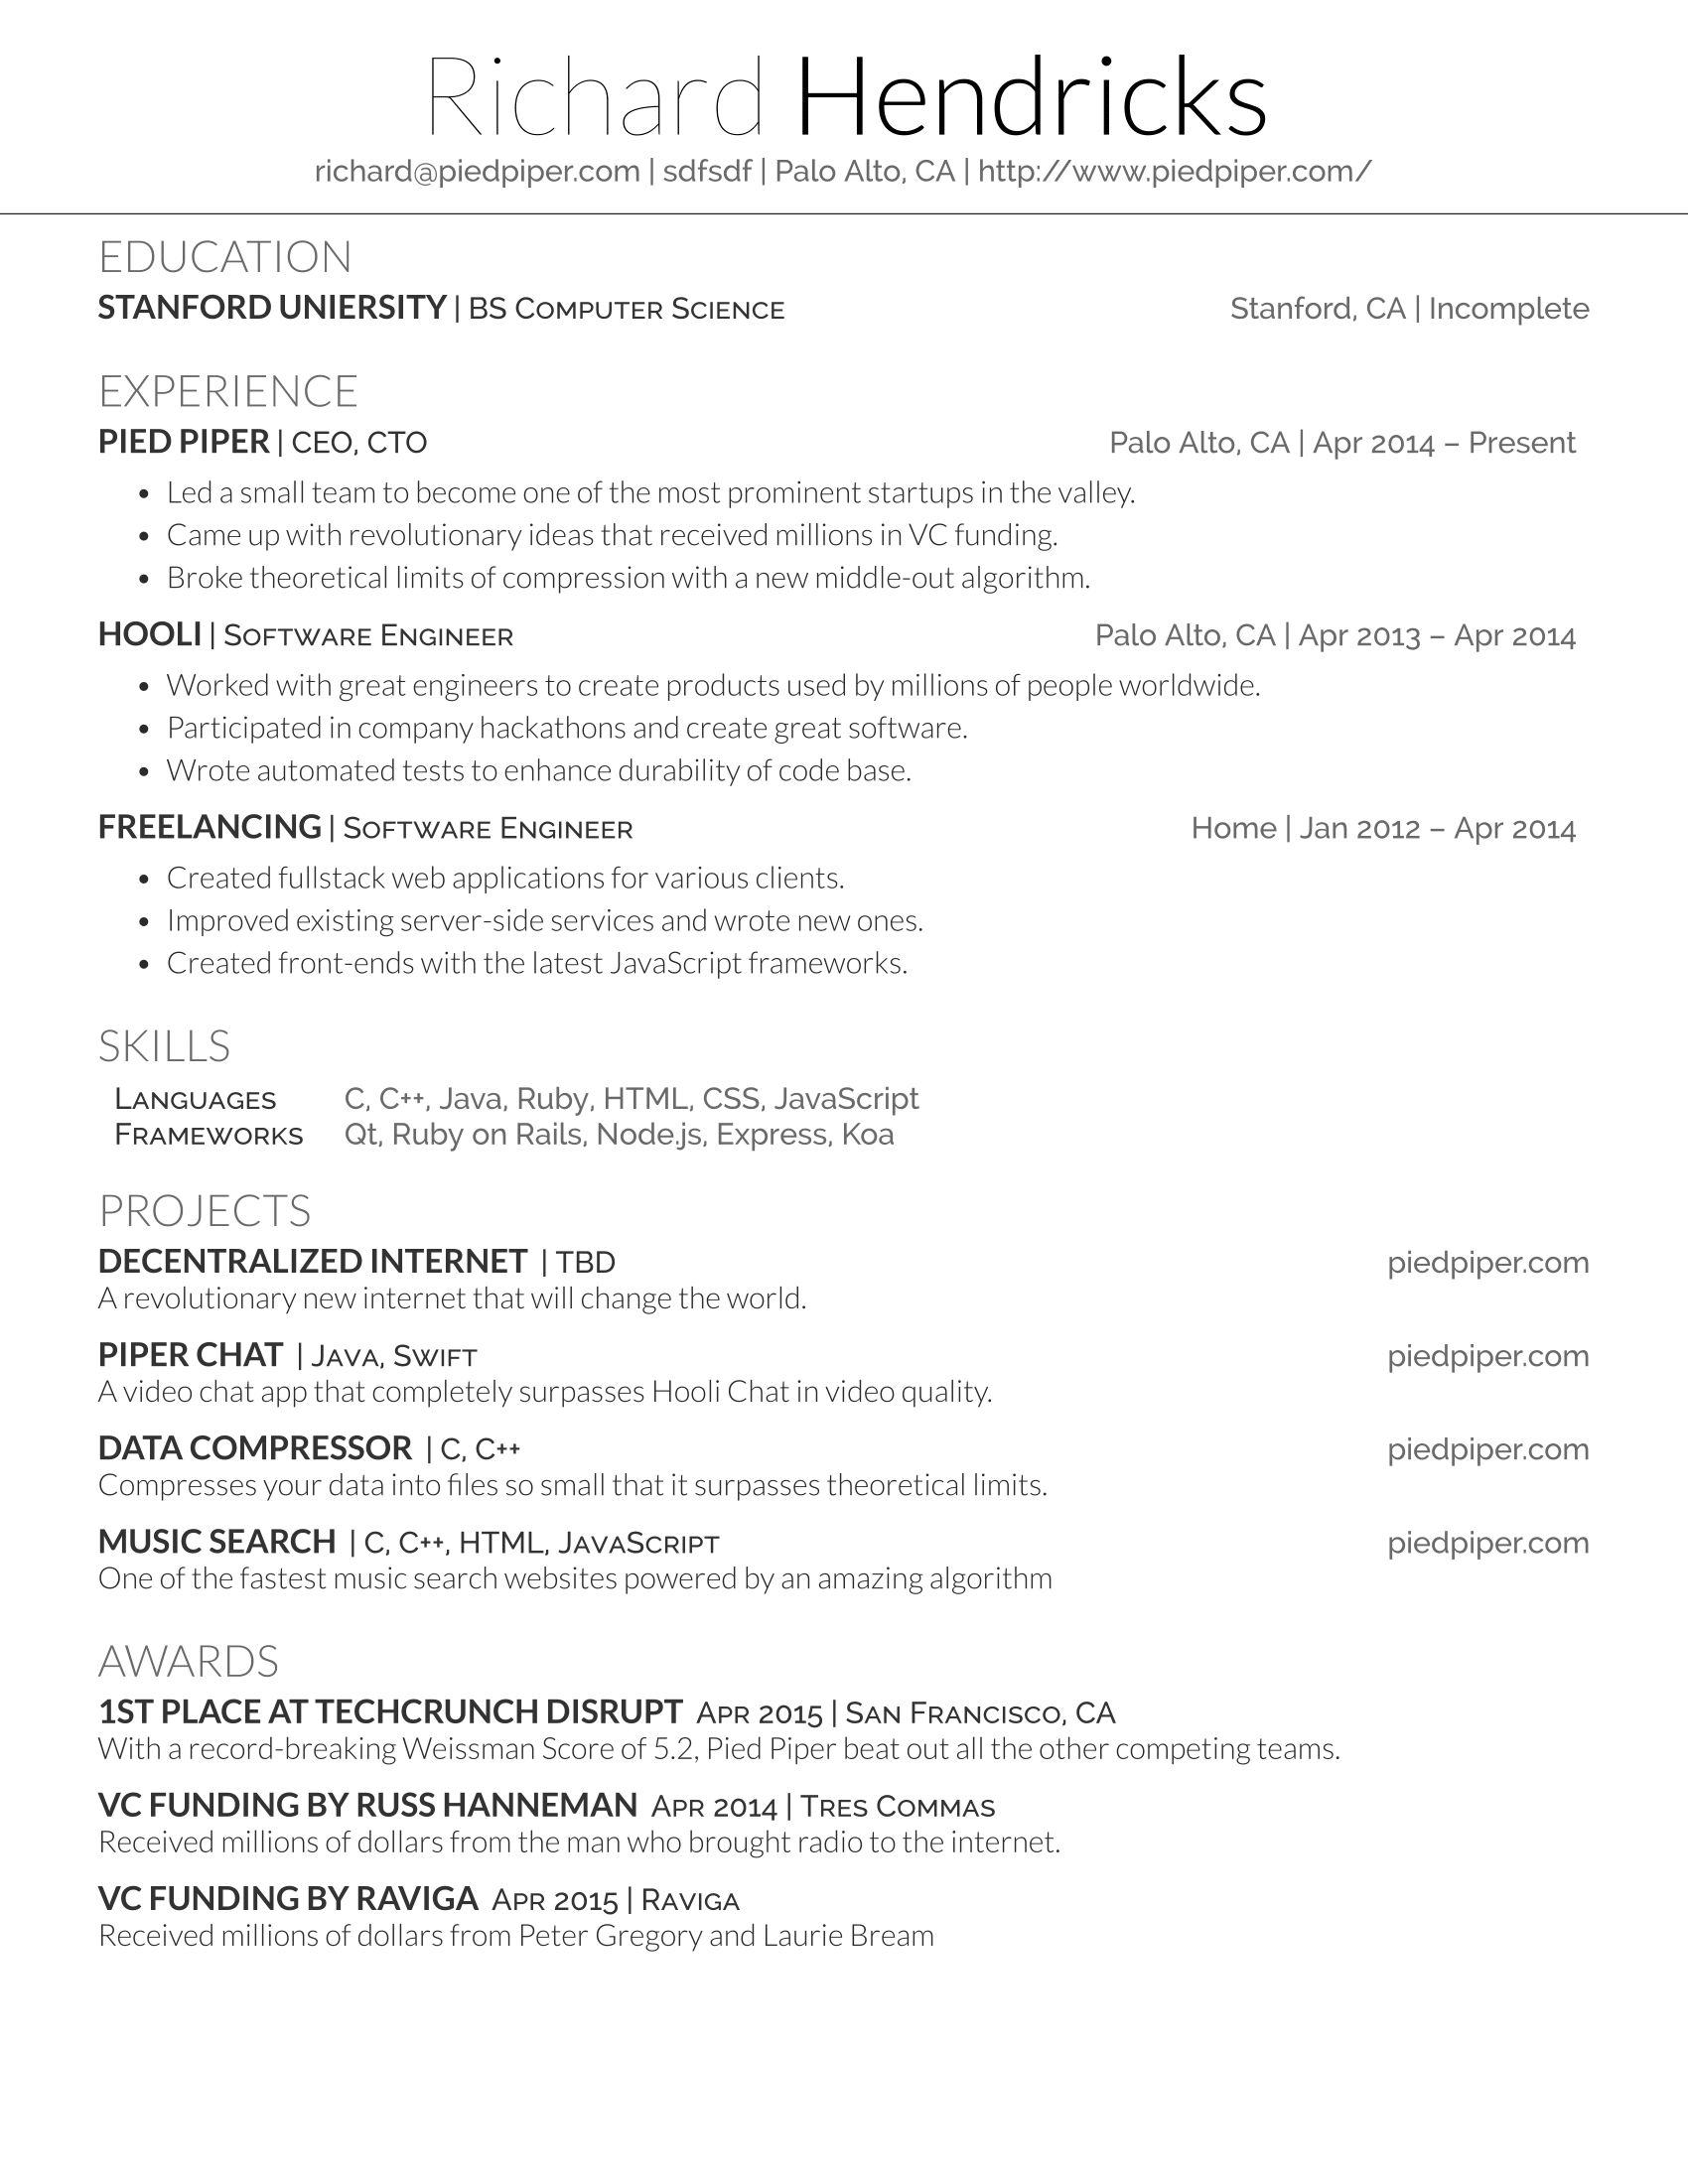 latex resume generator - Latex Resume